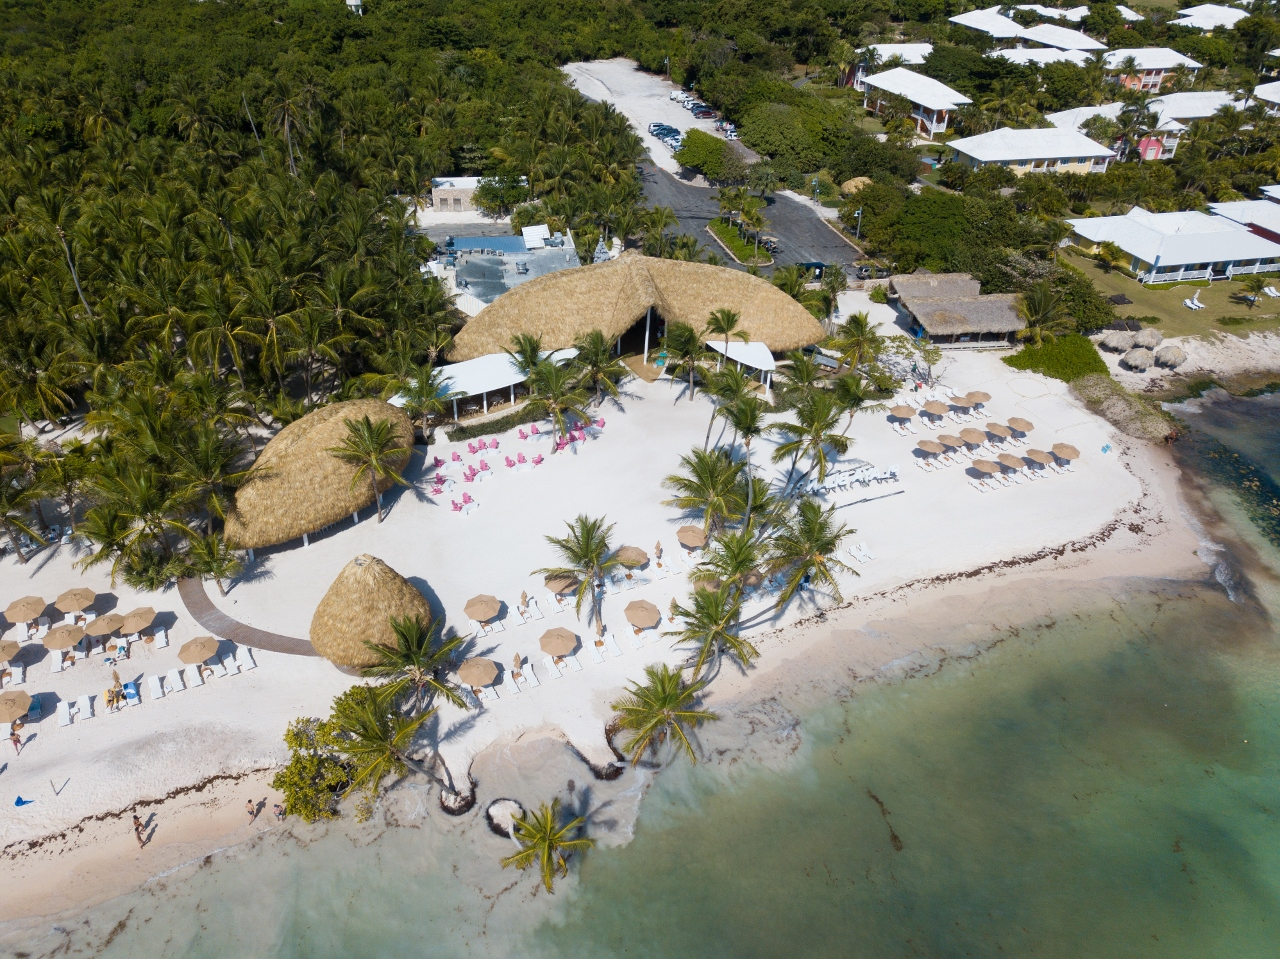 Playa Blanca aérea (1280x959)